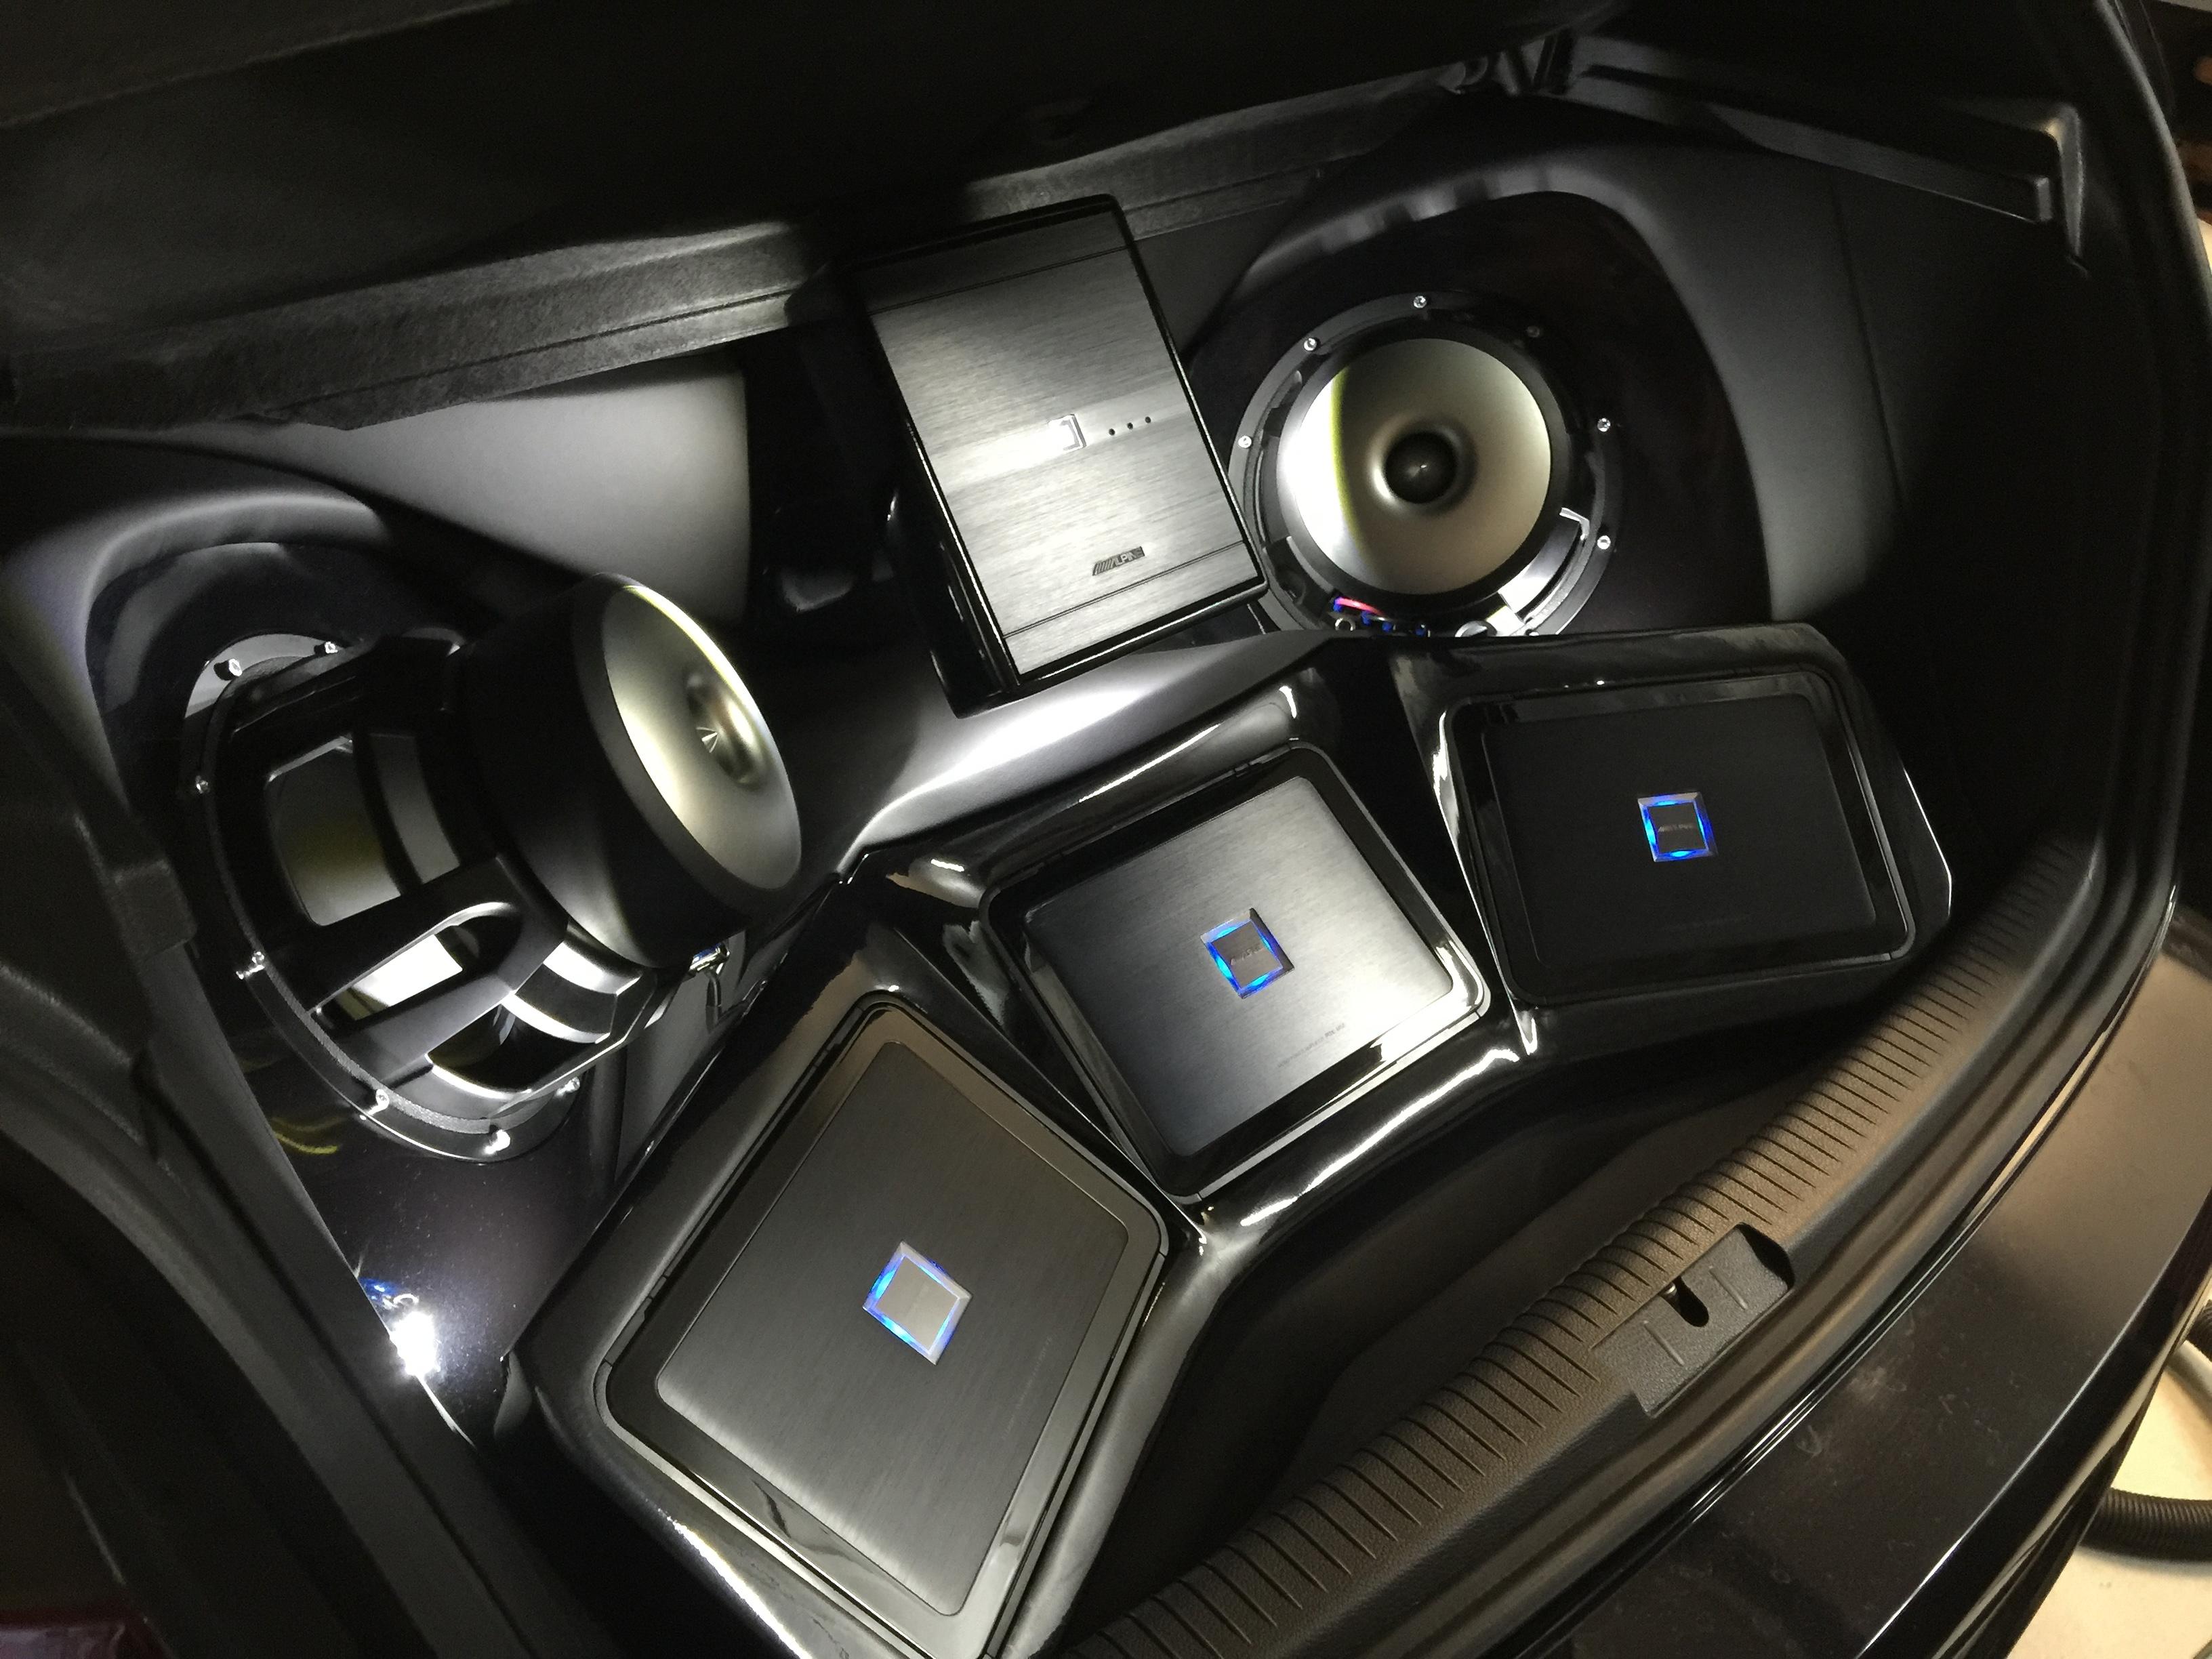 [DIAGRAM_1CA]  OC_2941] Alpine Car Audio Wiring Wiring Diagram | Alpine Car Audio Wiring |  | Jidig Taliz Urga Sapebe Mohammedshrine Librar Wiring 101